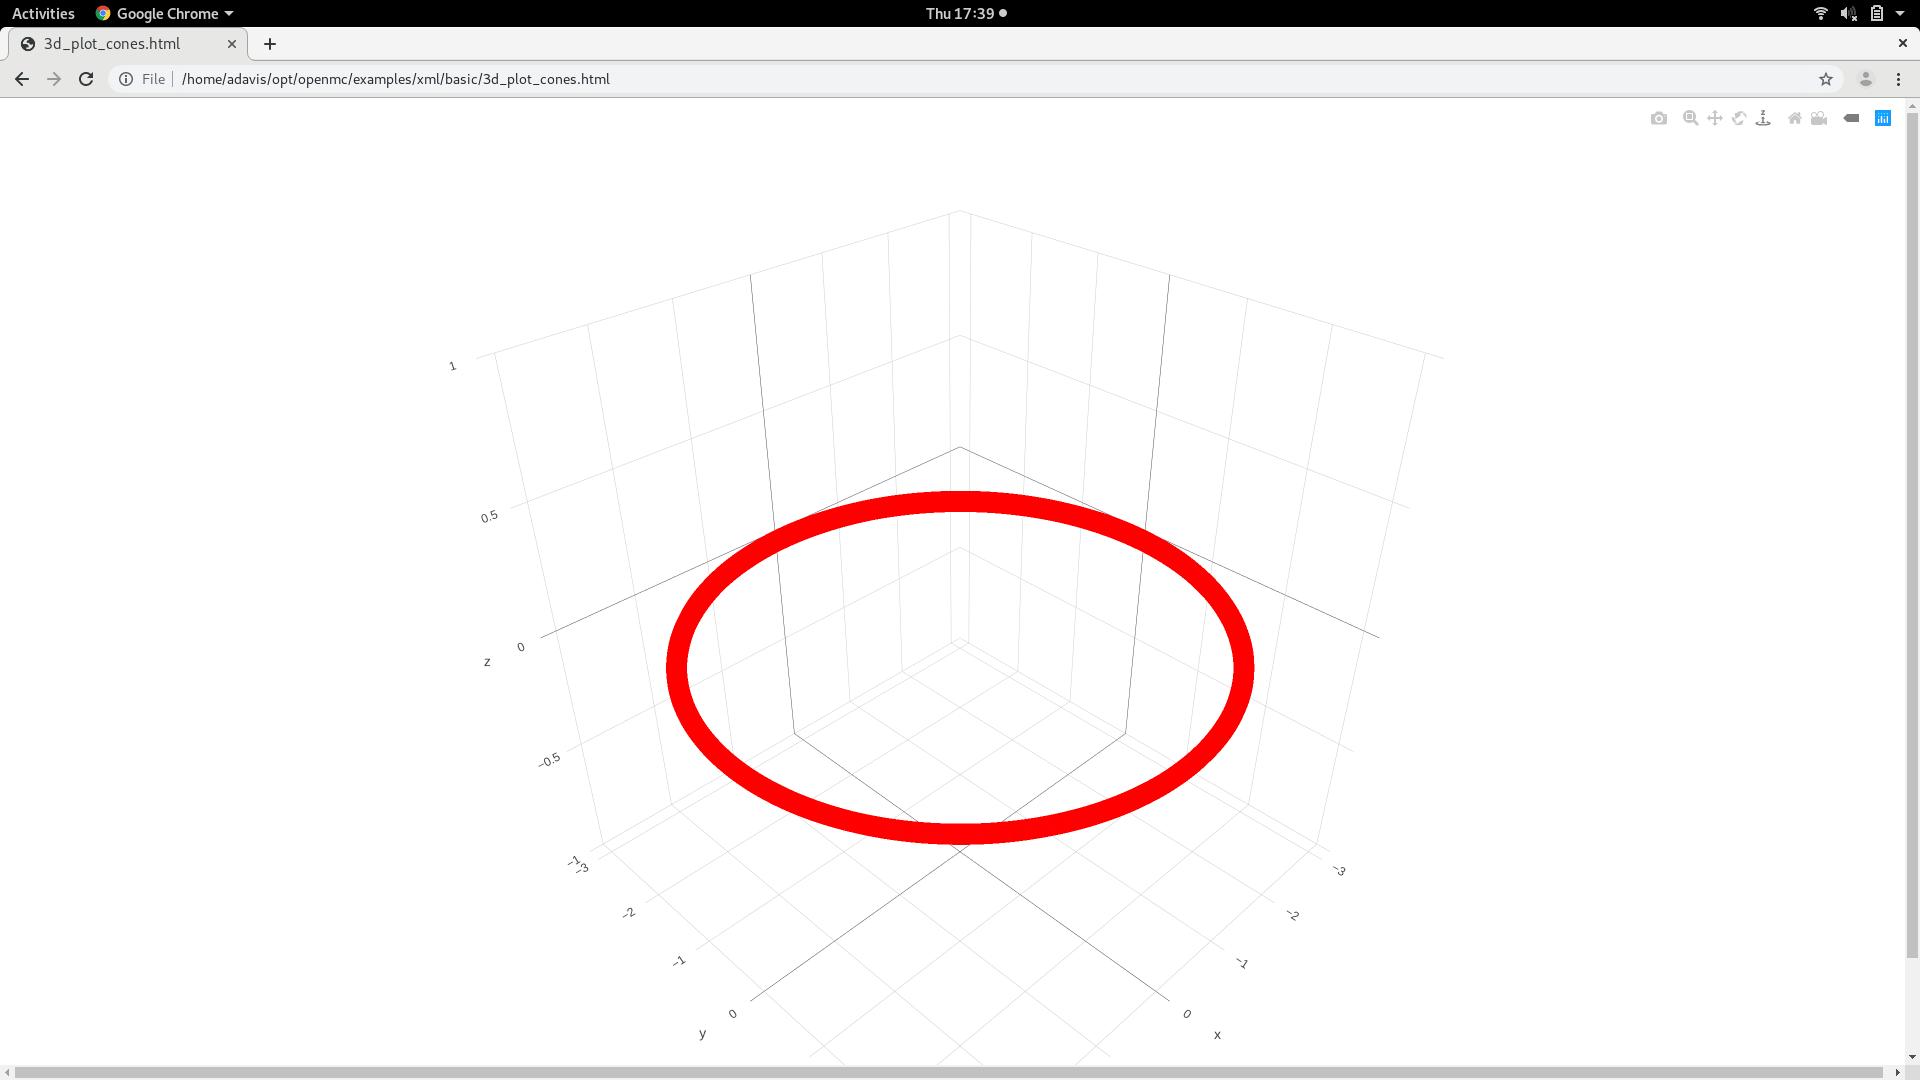 Madison : Urllib2 httperror http error 403 forbidden python 2 7